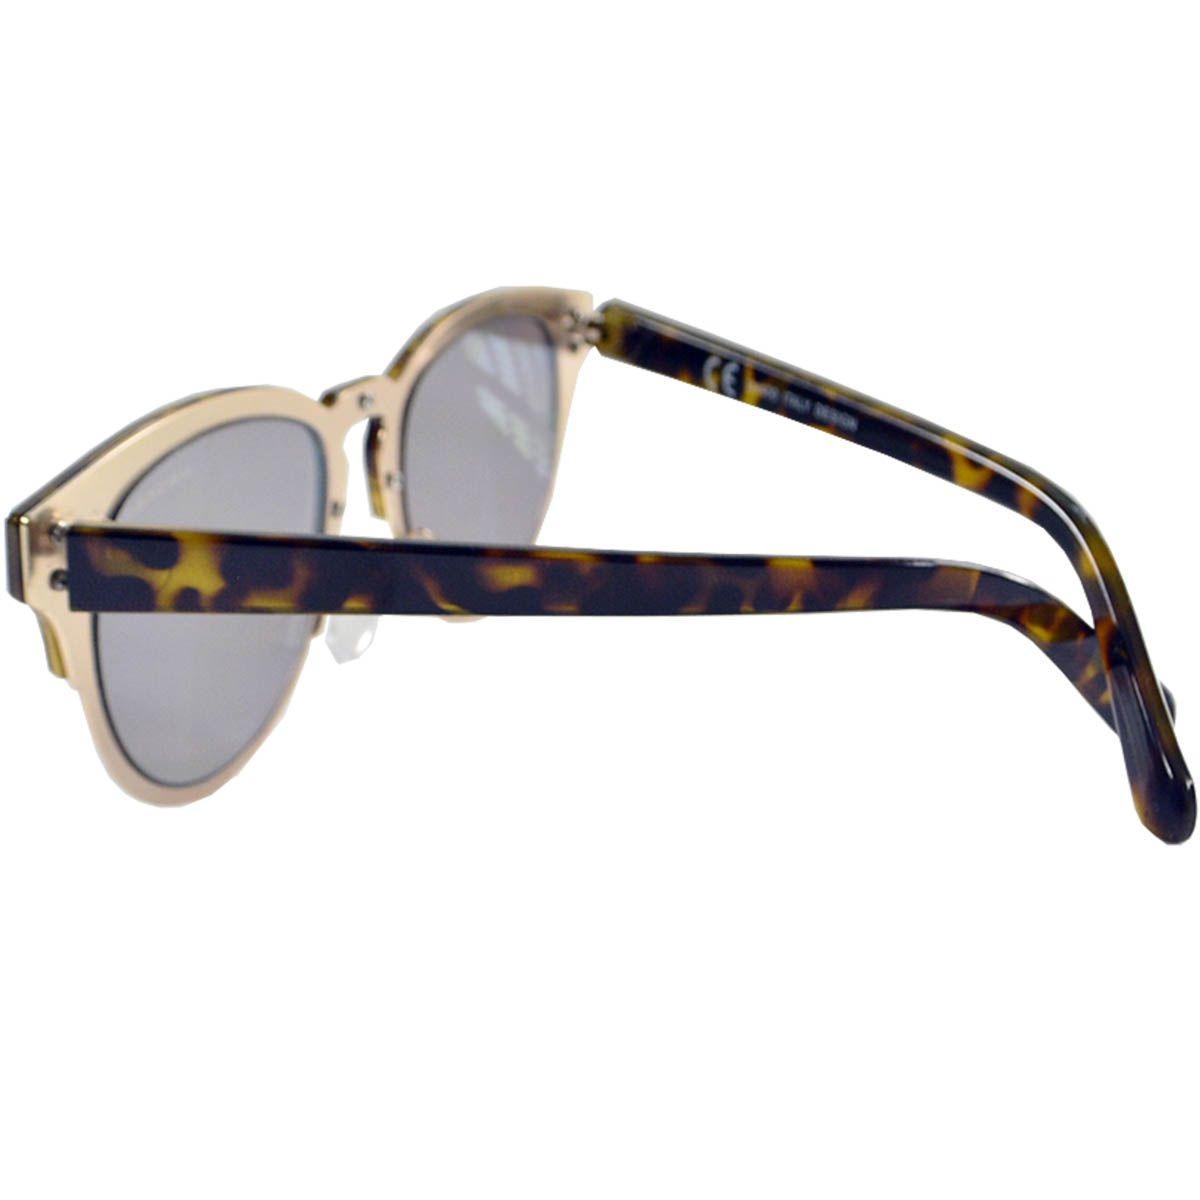 b082606605d60 óculos de sol mackage amk18219606c47 tarta e dourado. Carregando zoom.